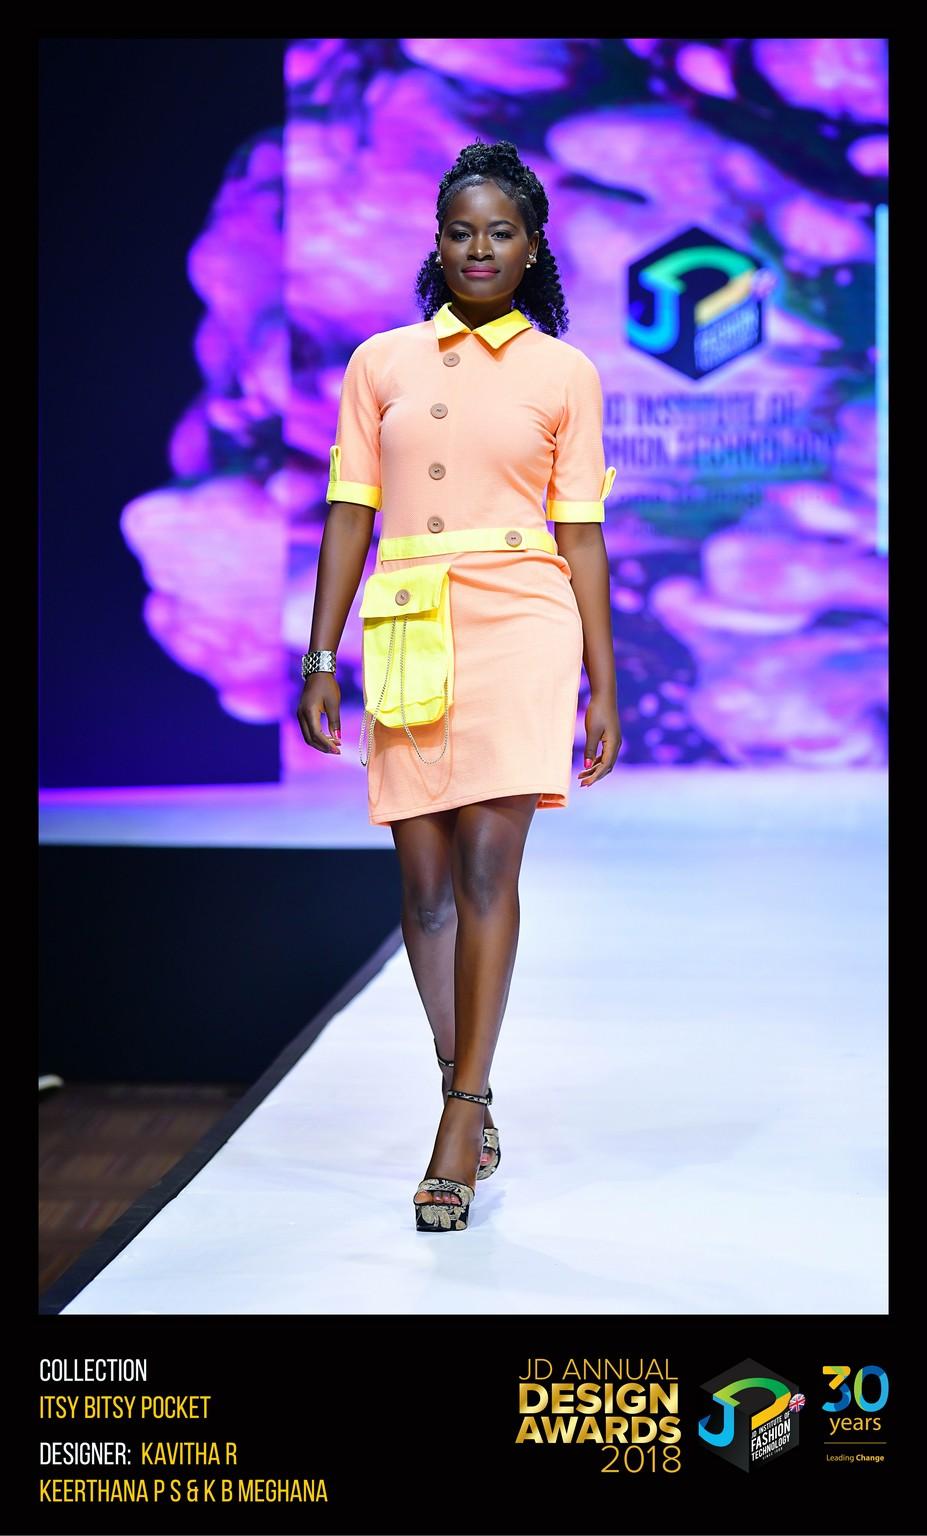 Itsy Bitsy Pocket Dress – Change – JD Annual Design Awards 2018   Designer: Kavitha, Keertana and Meghana   Photography : Jerin Nath (@jerin_nath) itsy bitsy pocket dress - ITSY BITSY POCKET3 - Itsy Bitsy Pocket Dress – Change – JD Annual Design Awards 2018